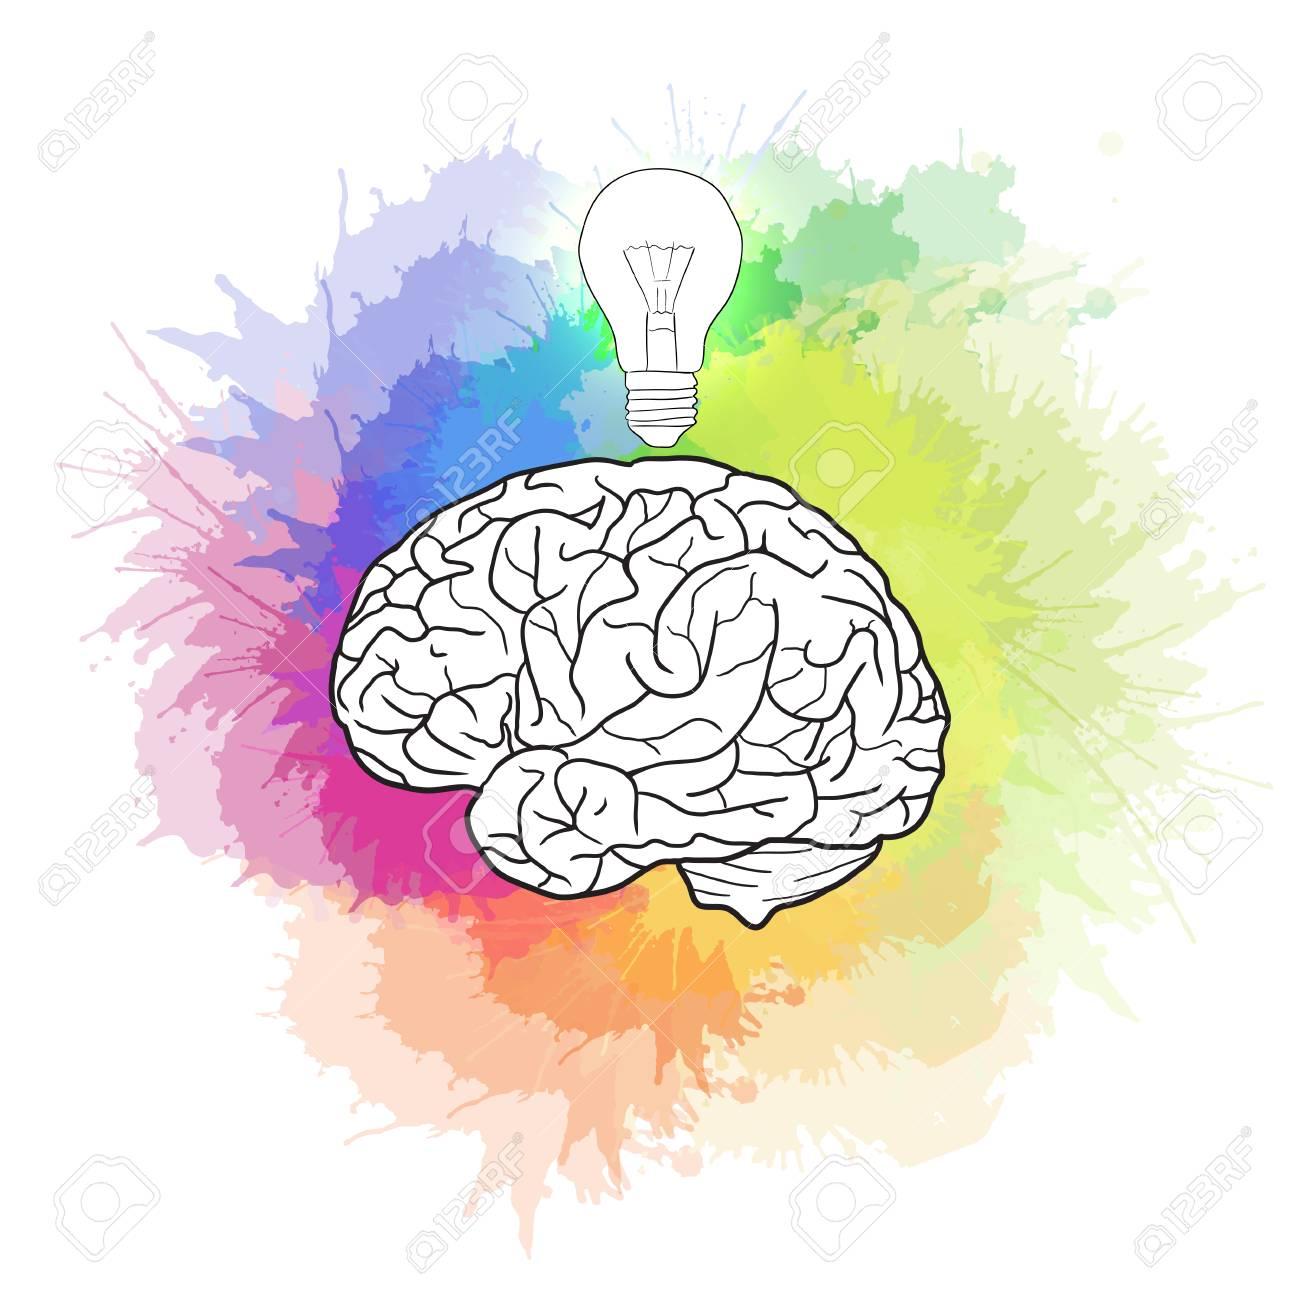 Captivating Linear Illustration Of Human Brain With Light Bulb And Rainbow Watercolor  Sprays. Creativity, Idea Photo Gallery